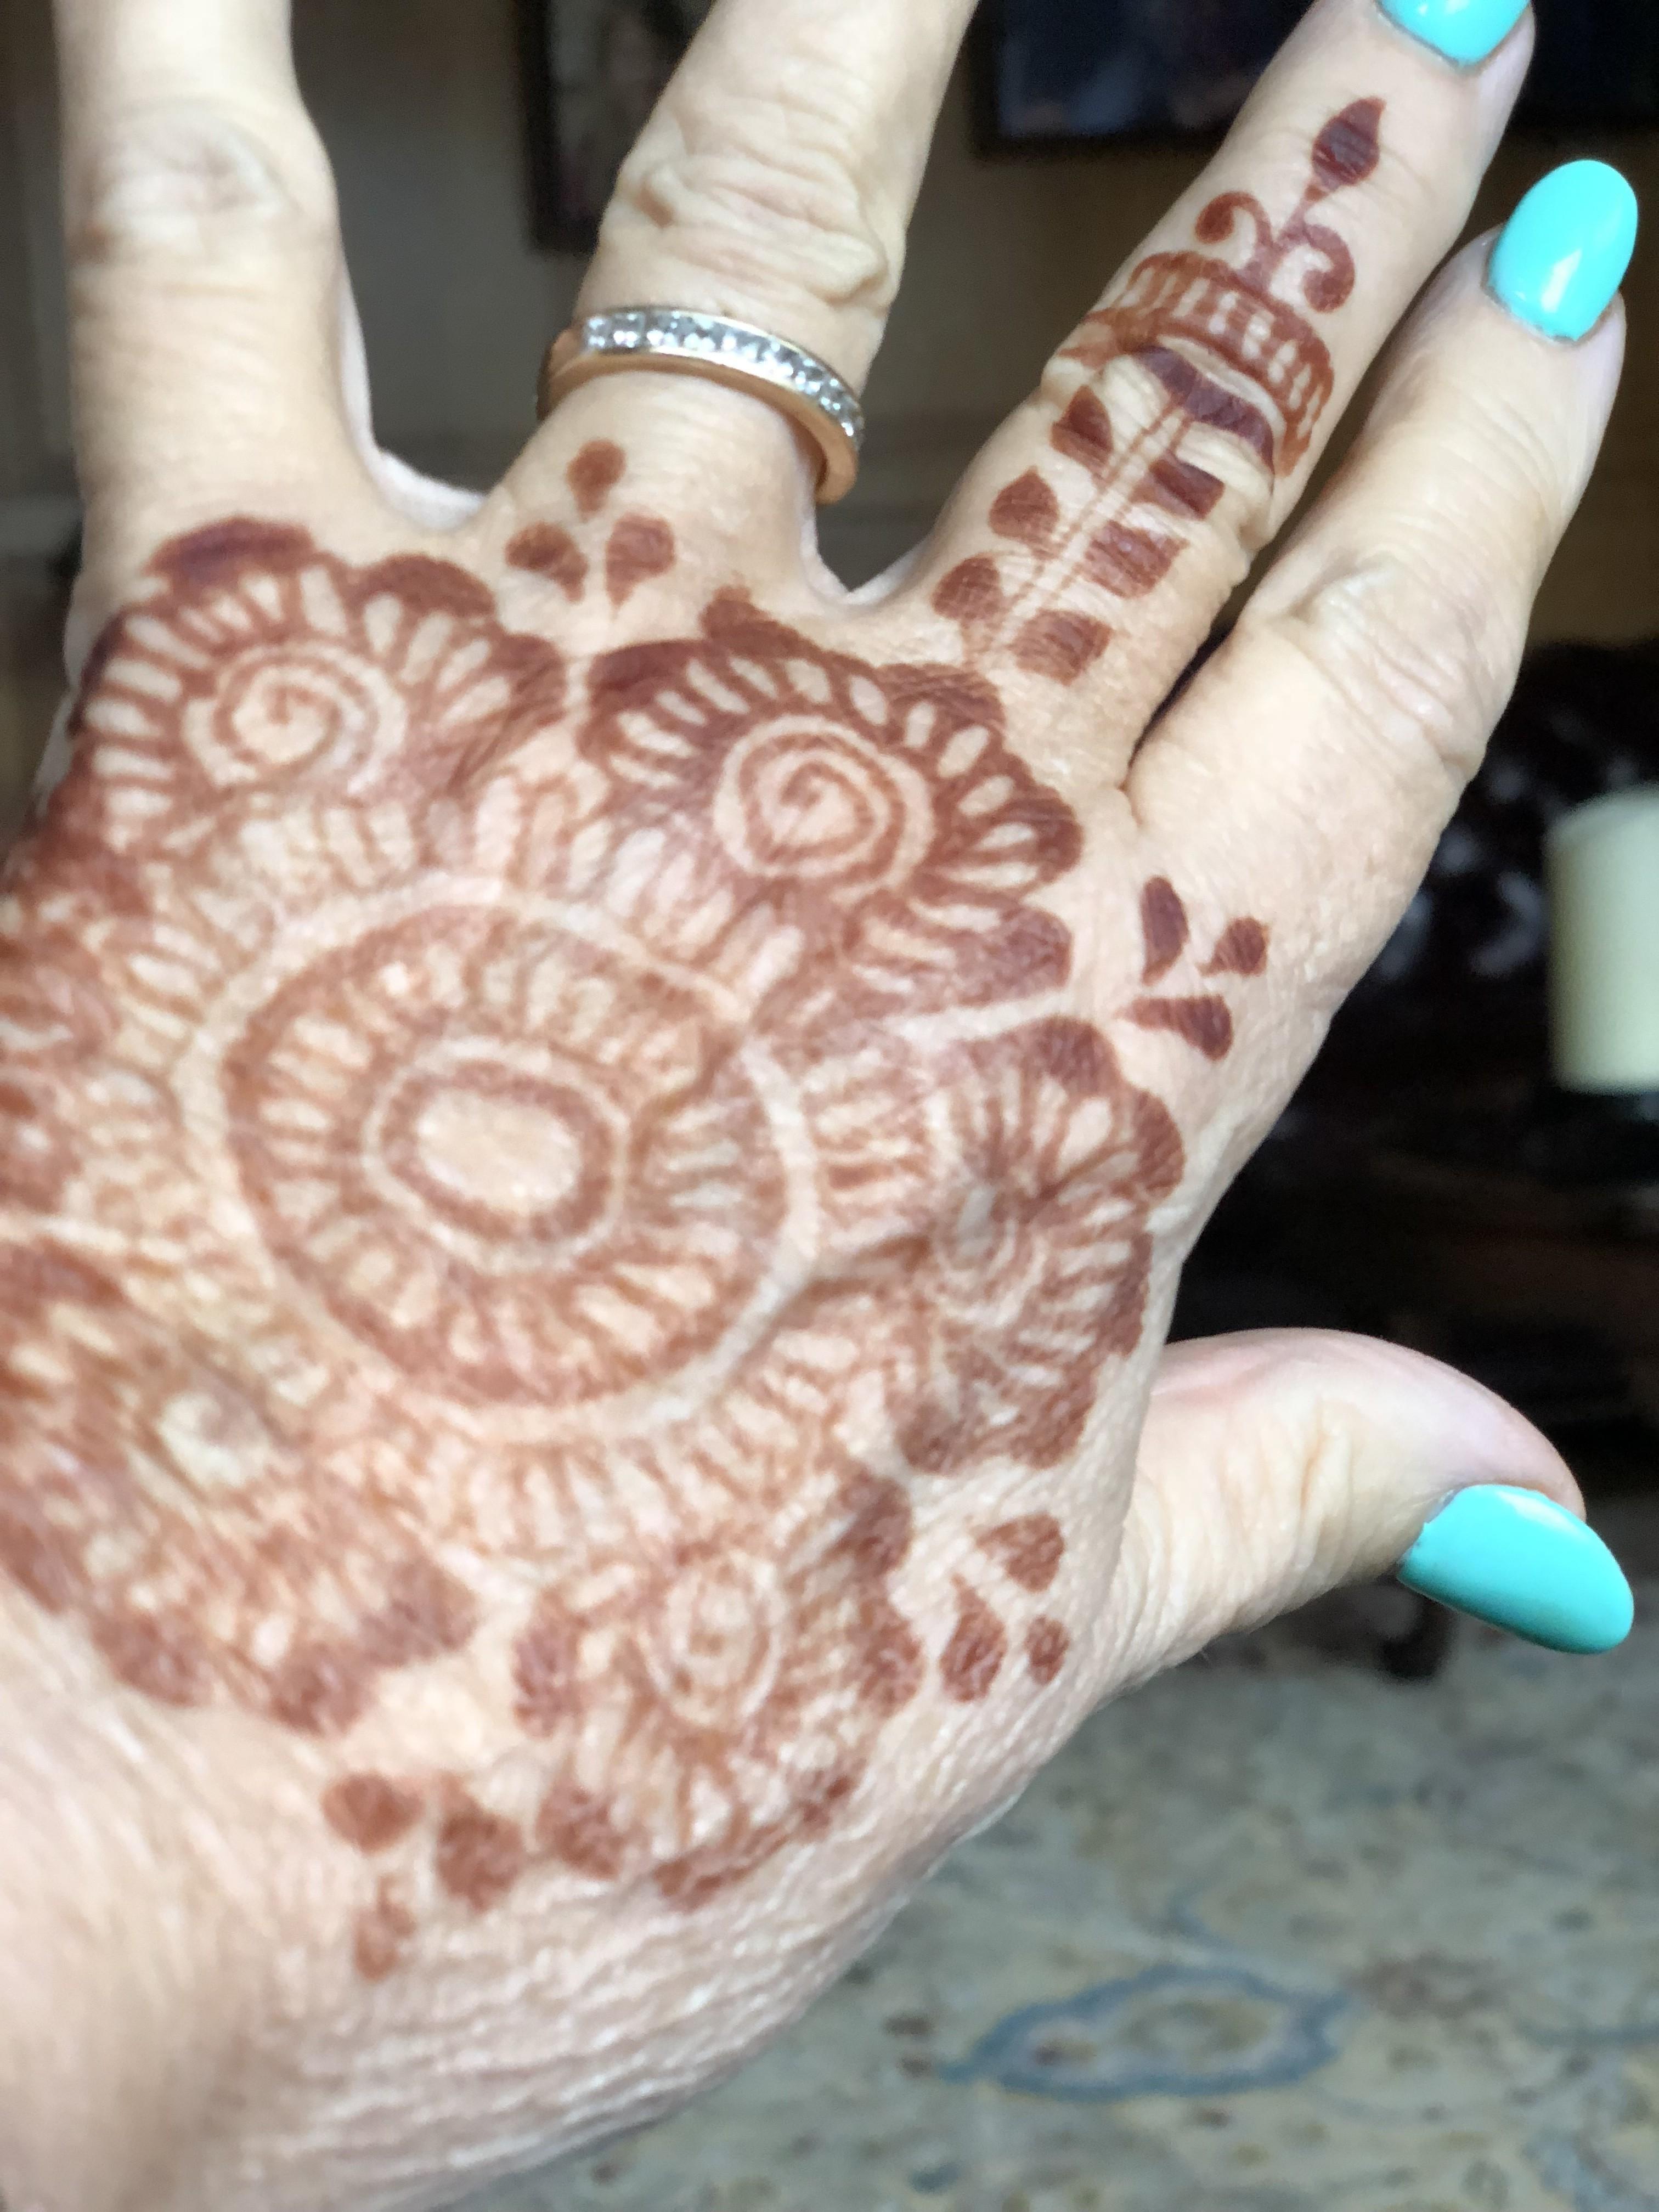 Henna Tattoo Artist Rental: Henna Tattoo Artist In Frisco, Texas